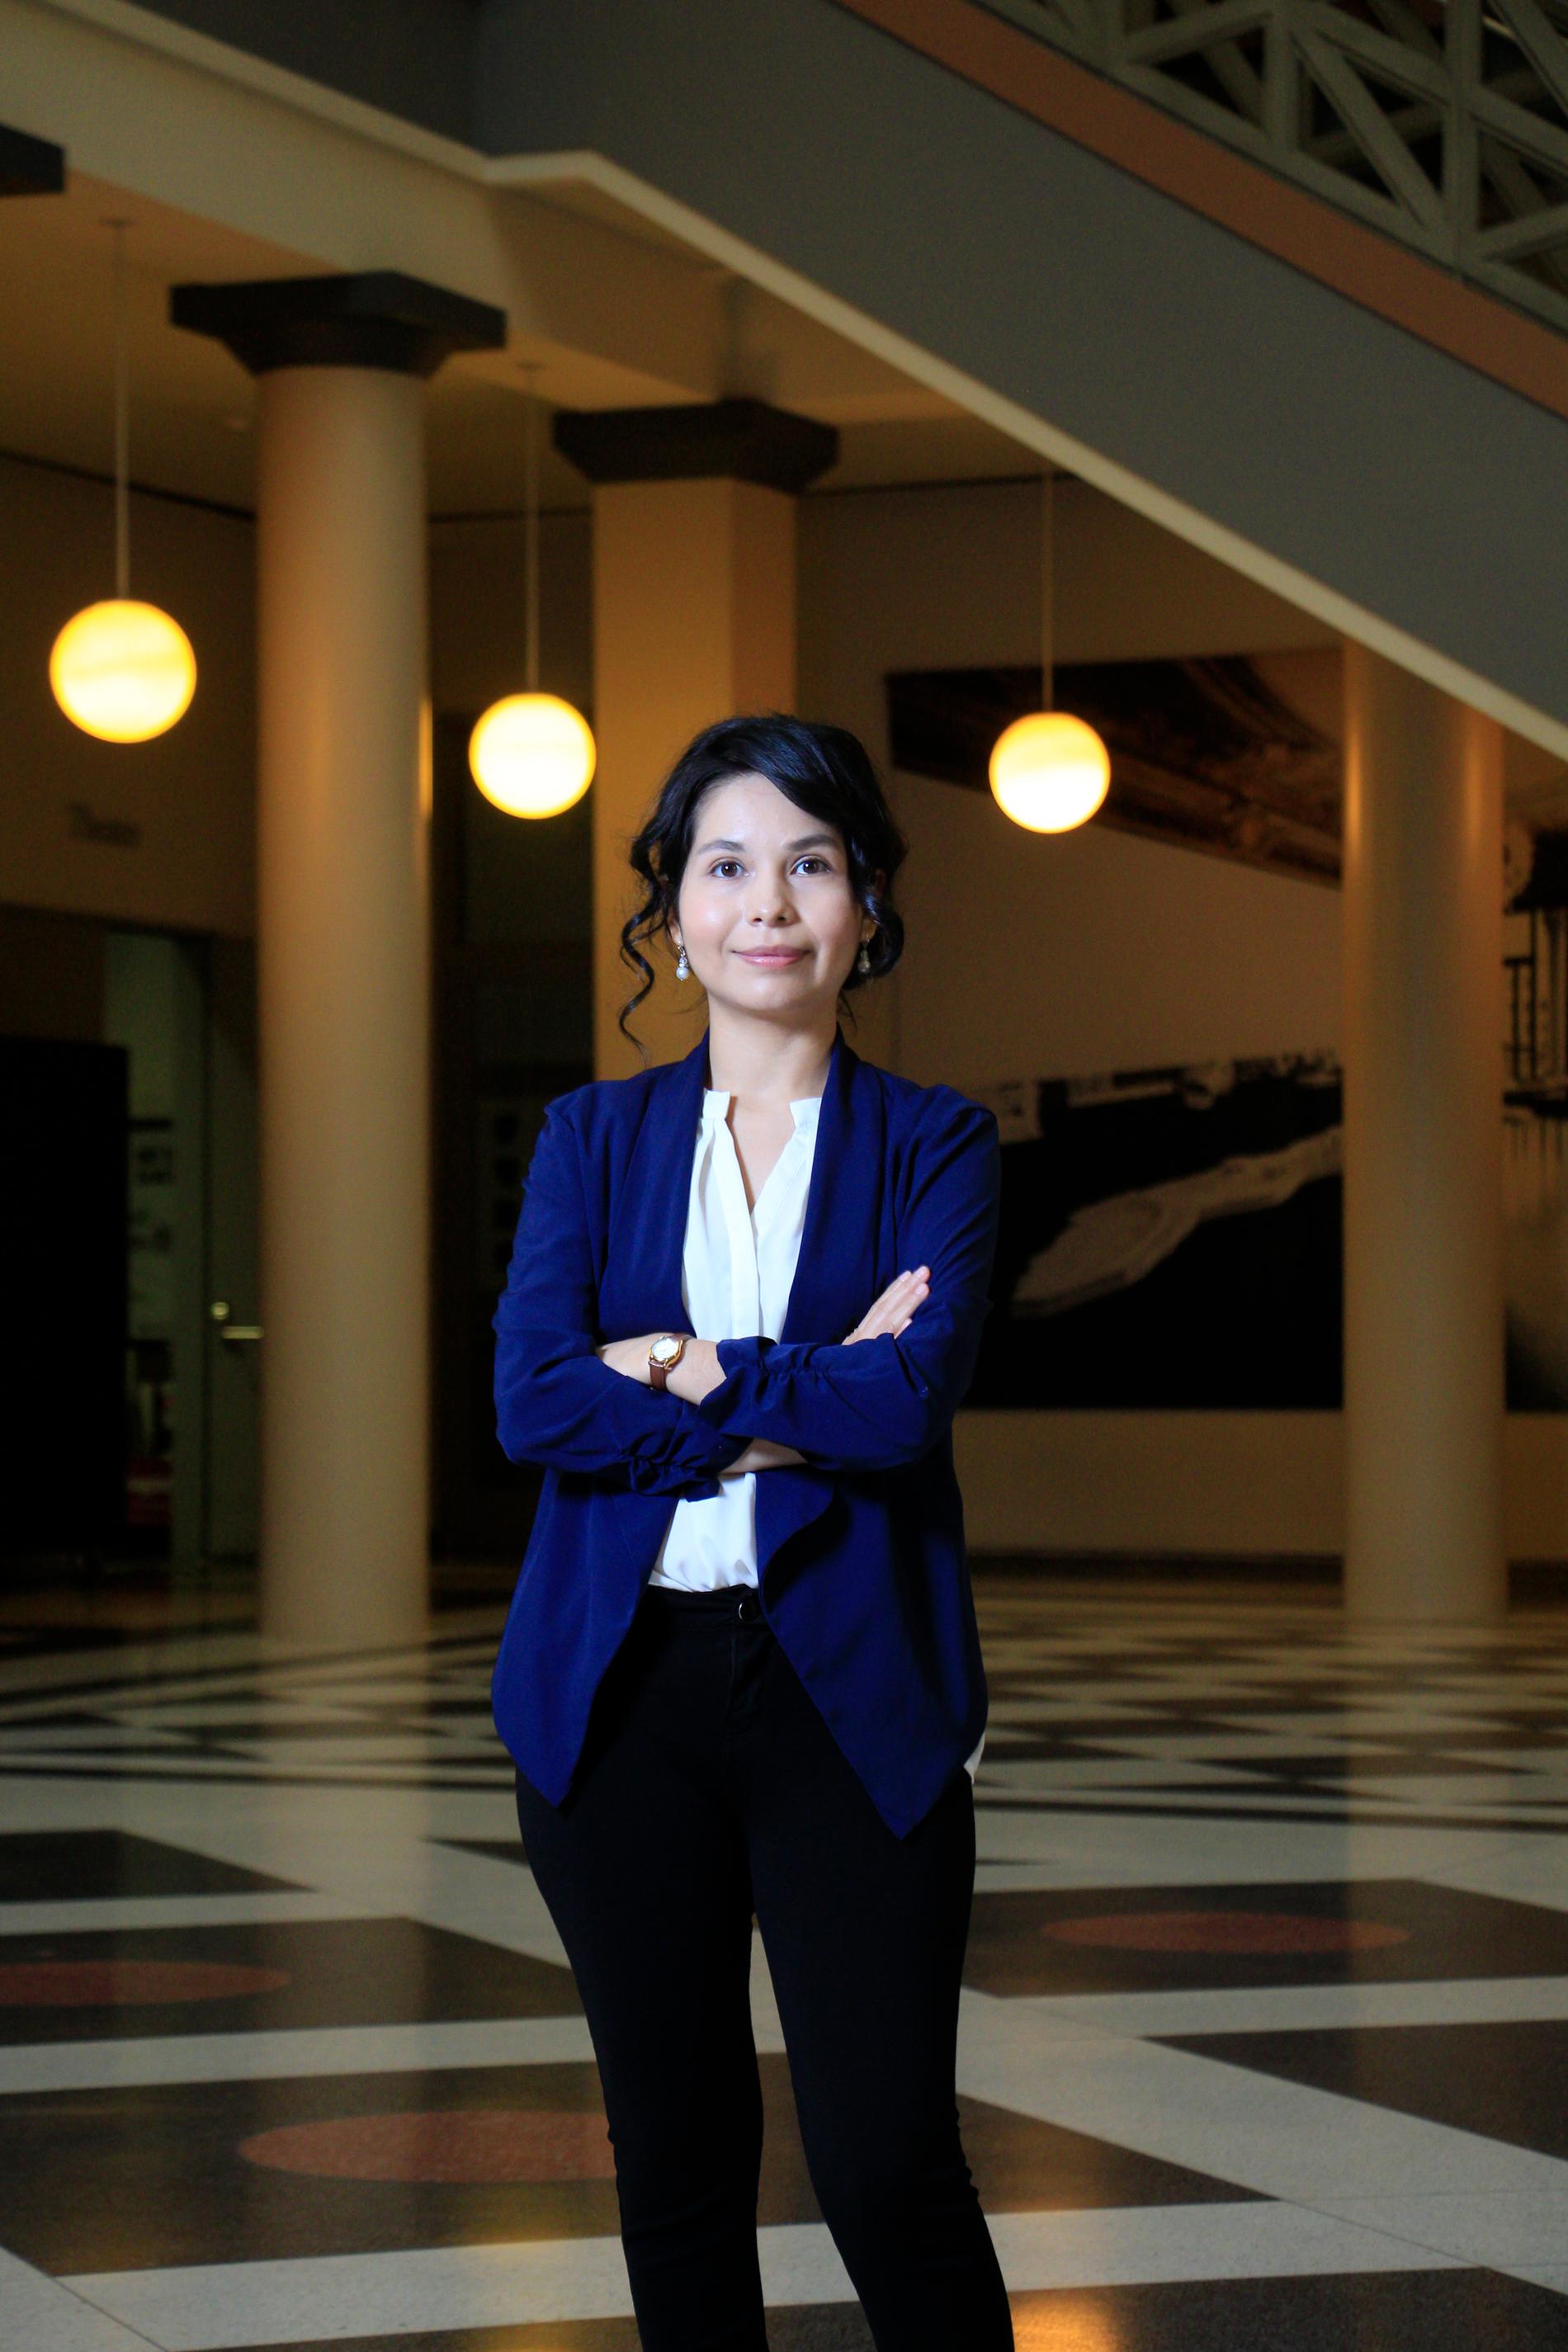 photo of Edith Villasenor standing in Atrium of Architecture building